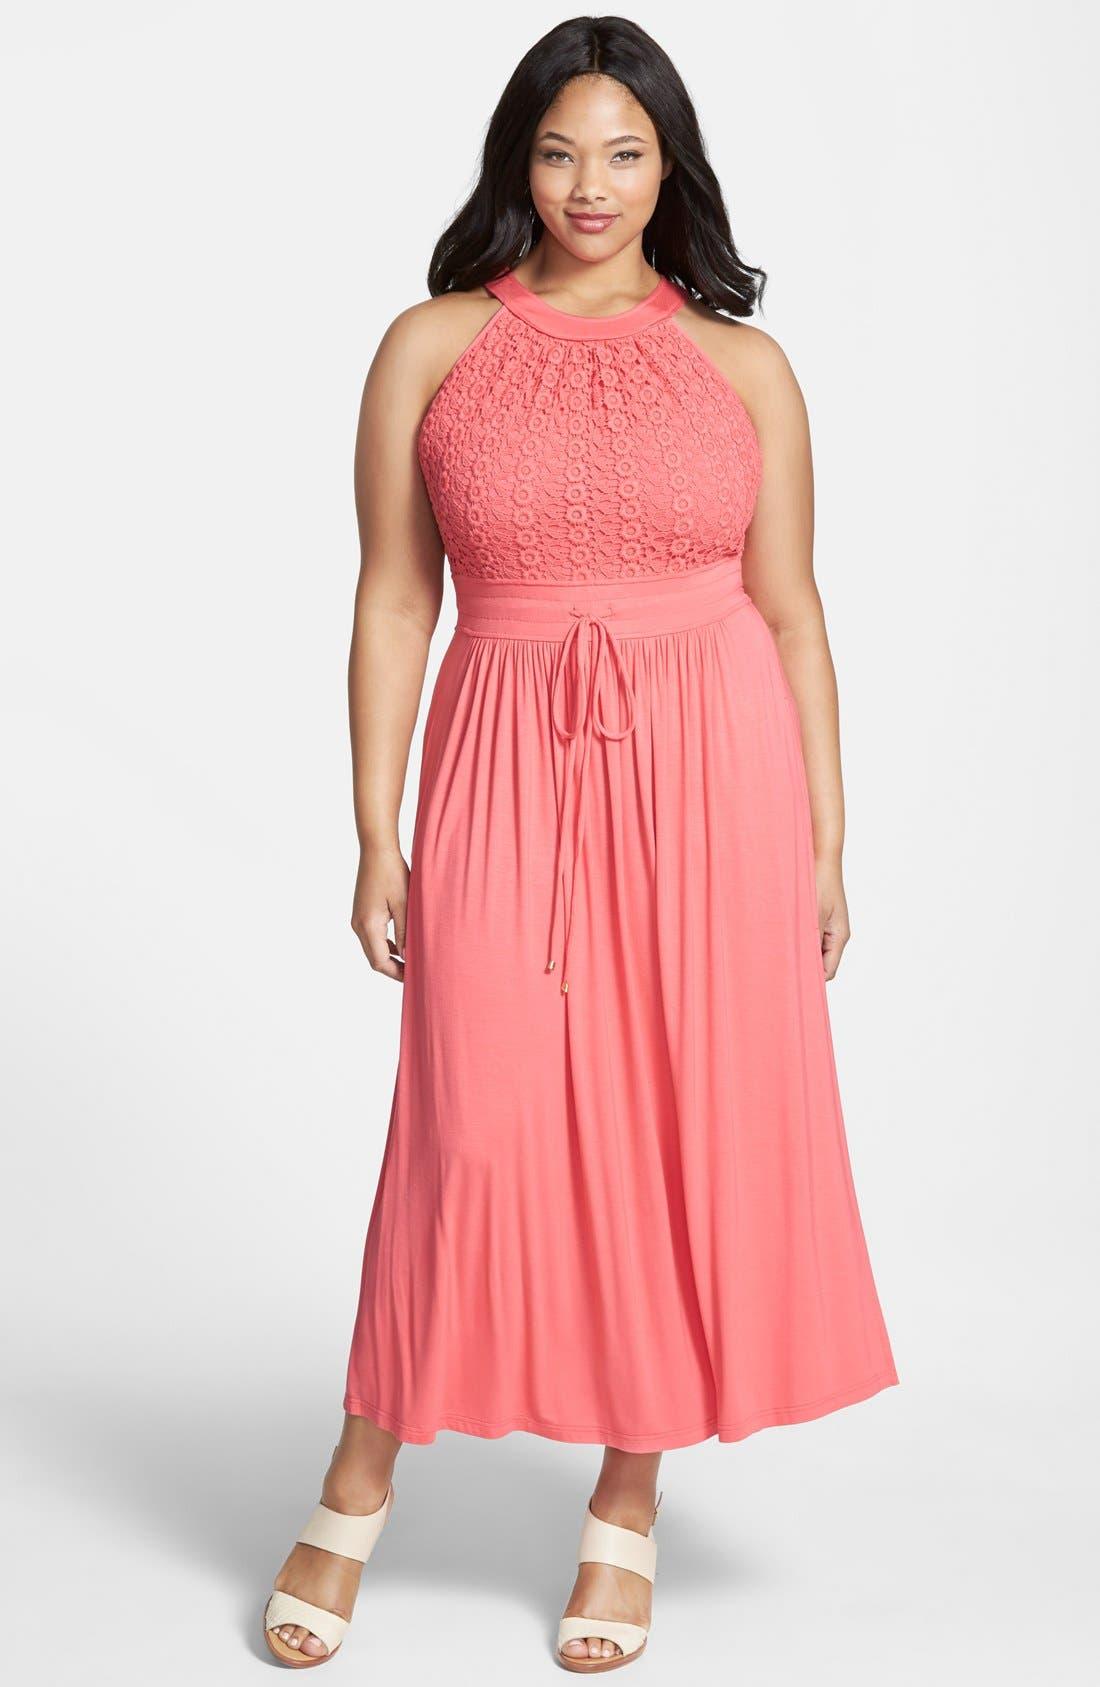 Alternate Image 1 Selected - Calvin Klein Lace Bodice Maxi Dress (Plus Size)